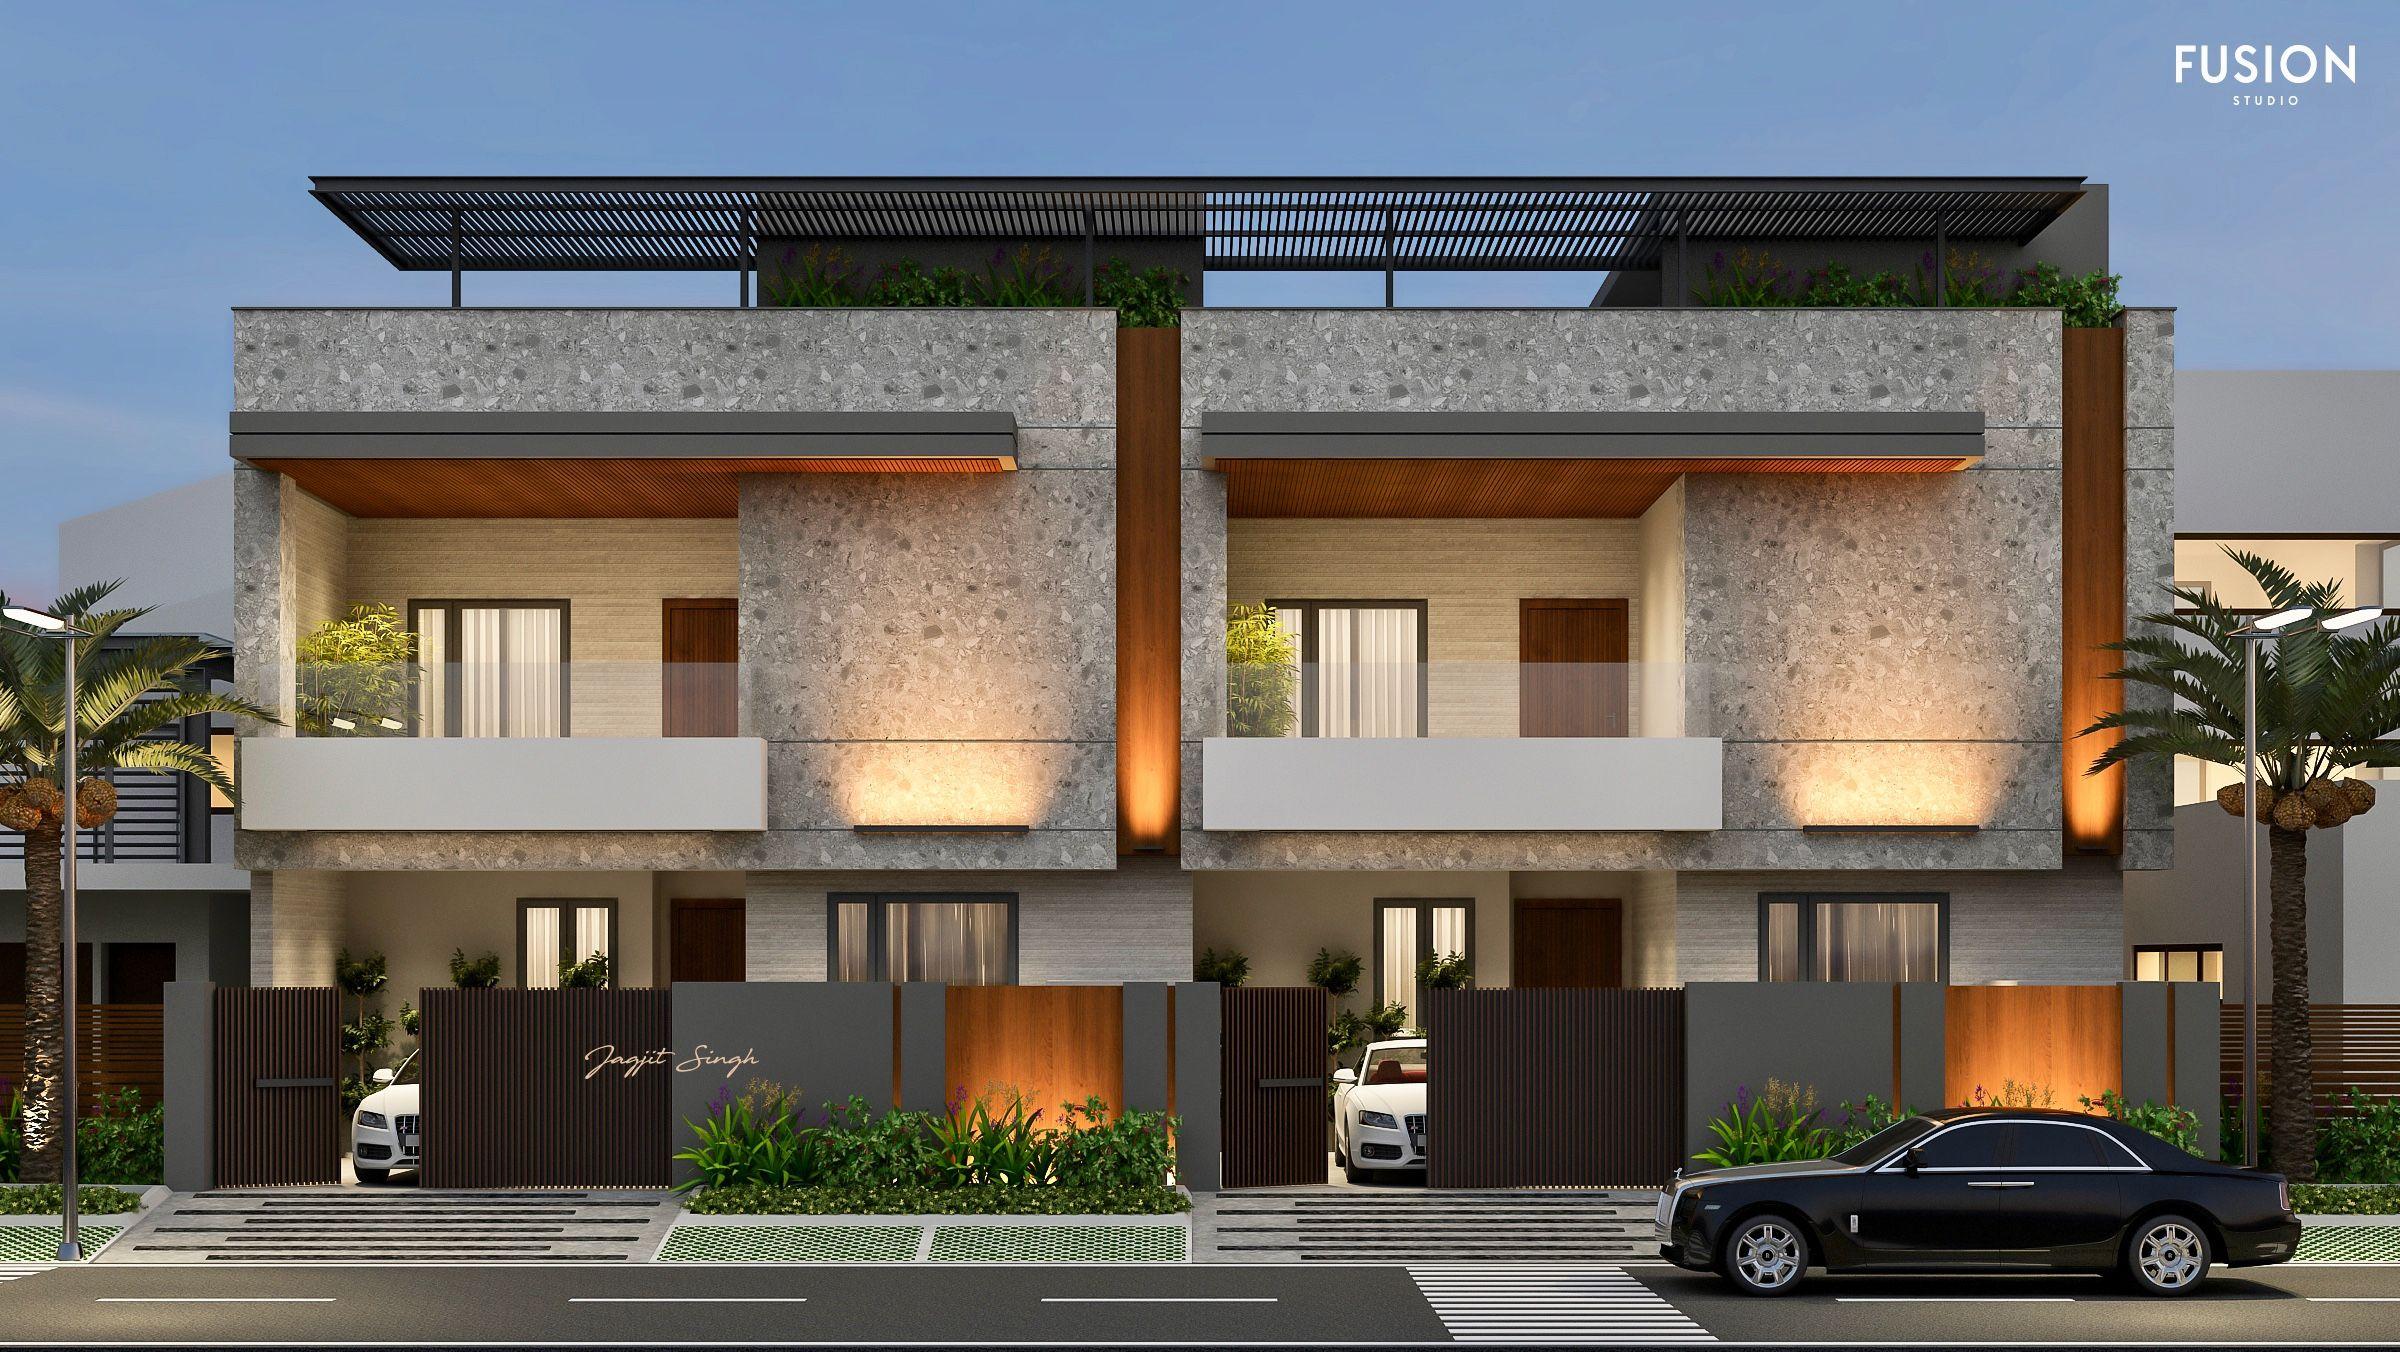 Jagjit Singh On Behance Row House Design Architectural House Plans Best Modern House Design